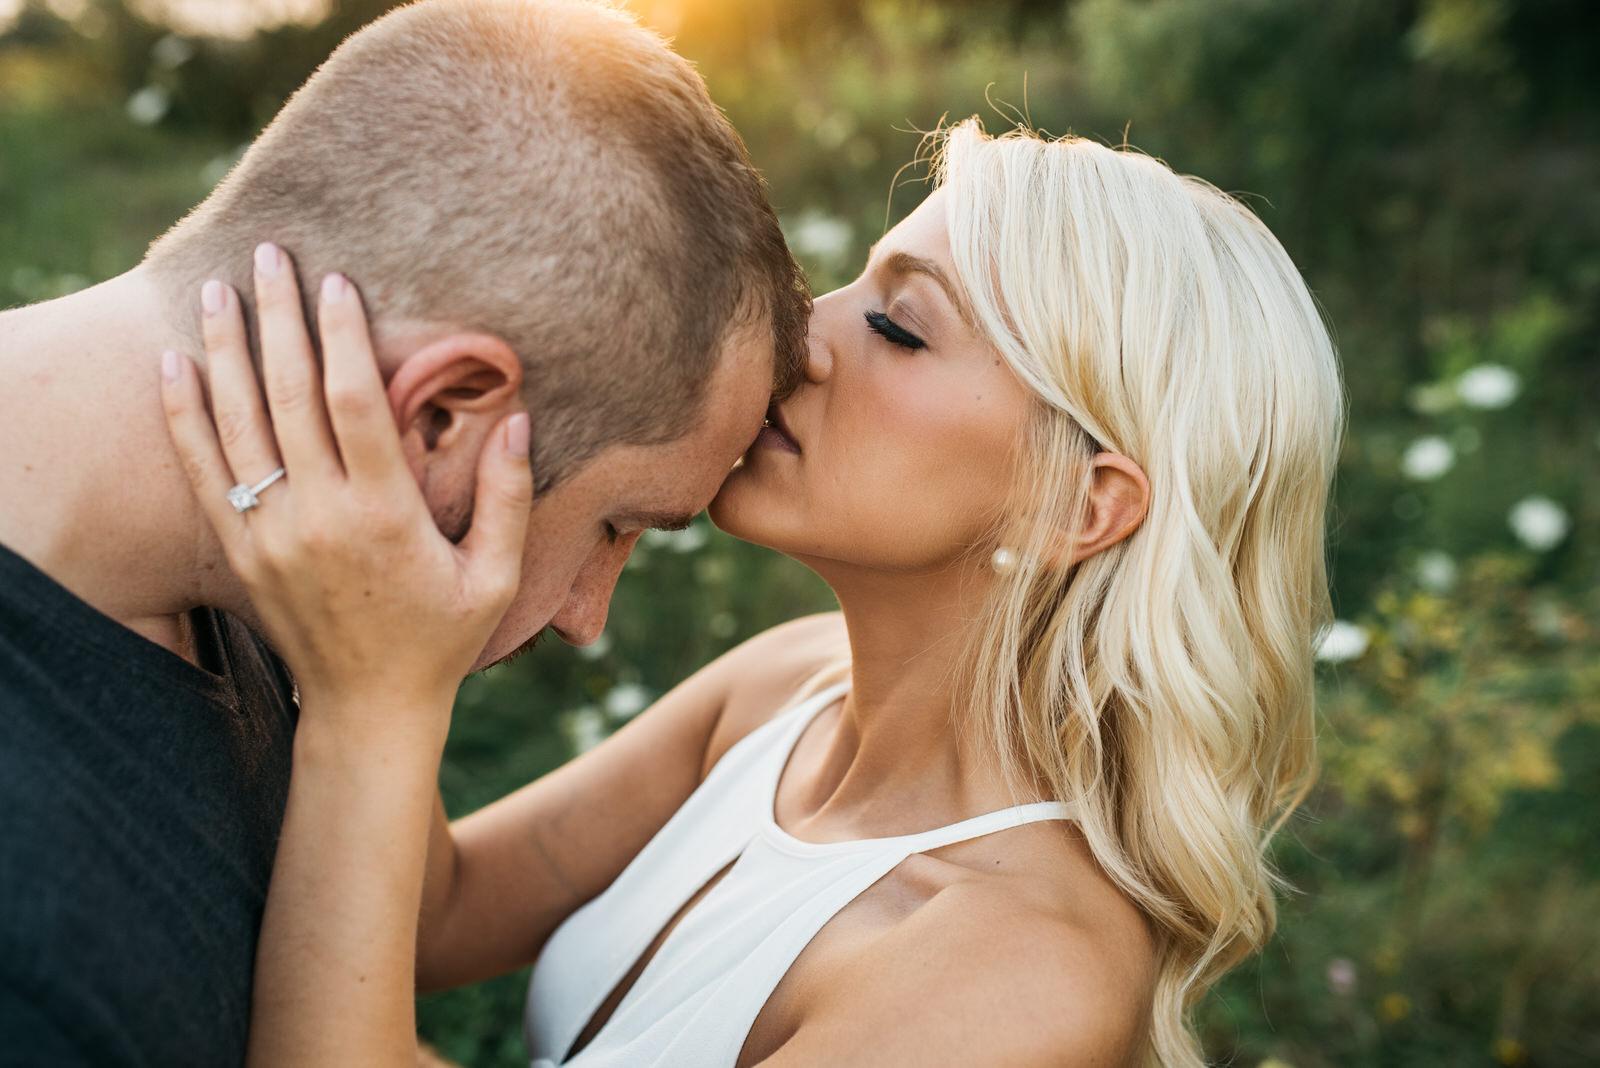 McConnells-Mill-Engagement-Photos-58.jpg